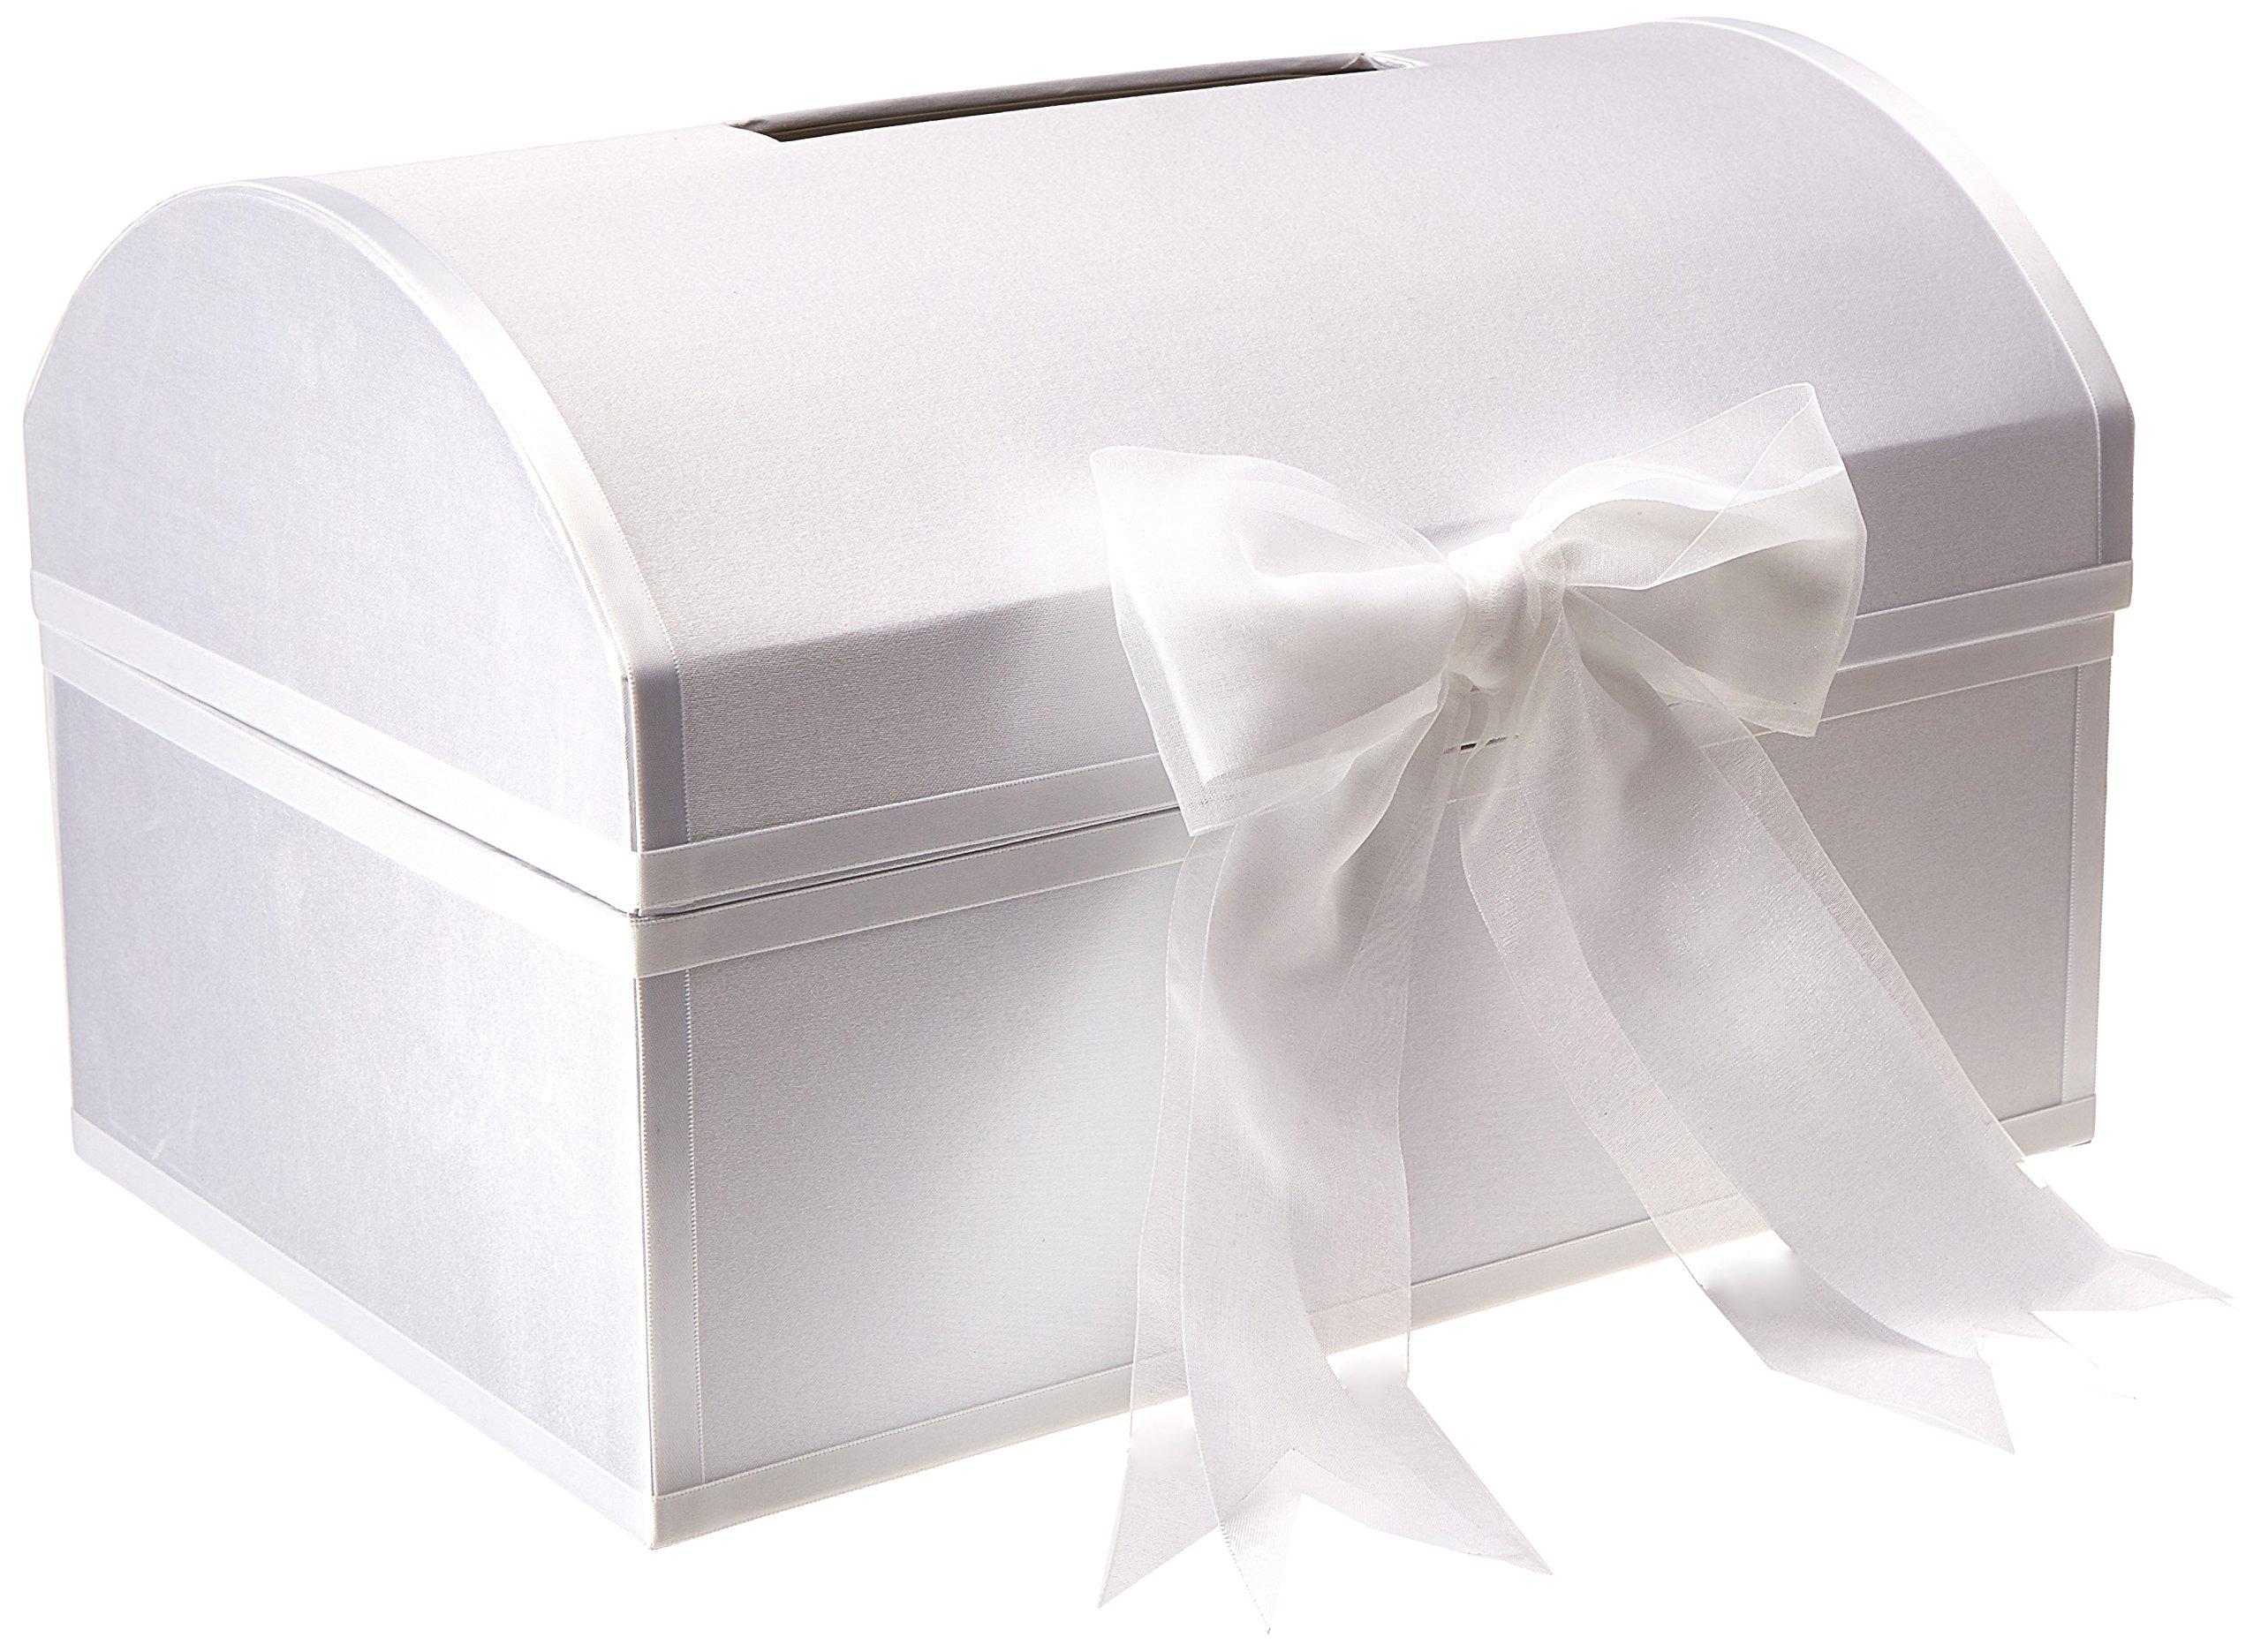 Card Gift Box Wedding: Wedding Gift Card Boxes For Reception: Amazon.com